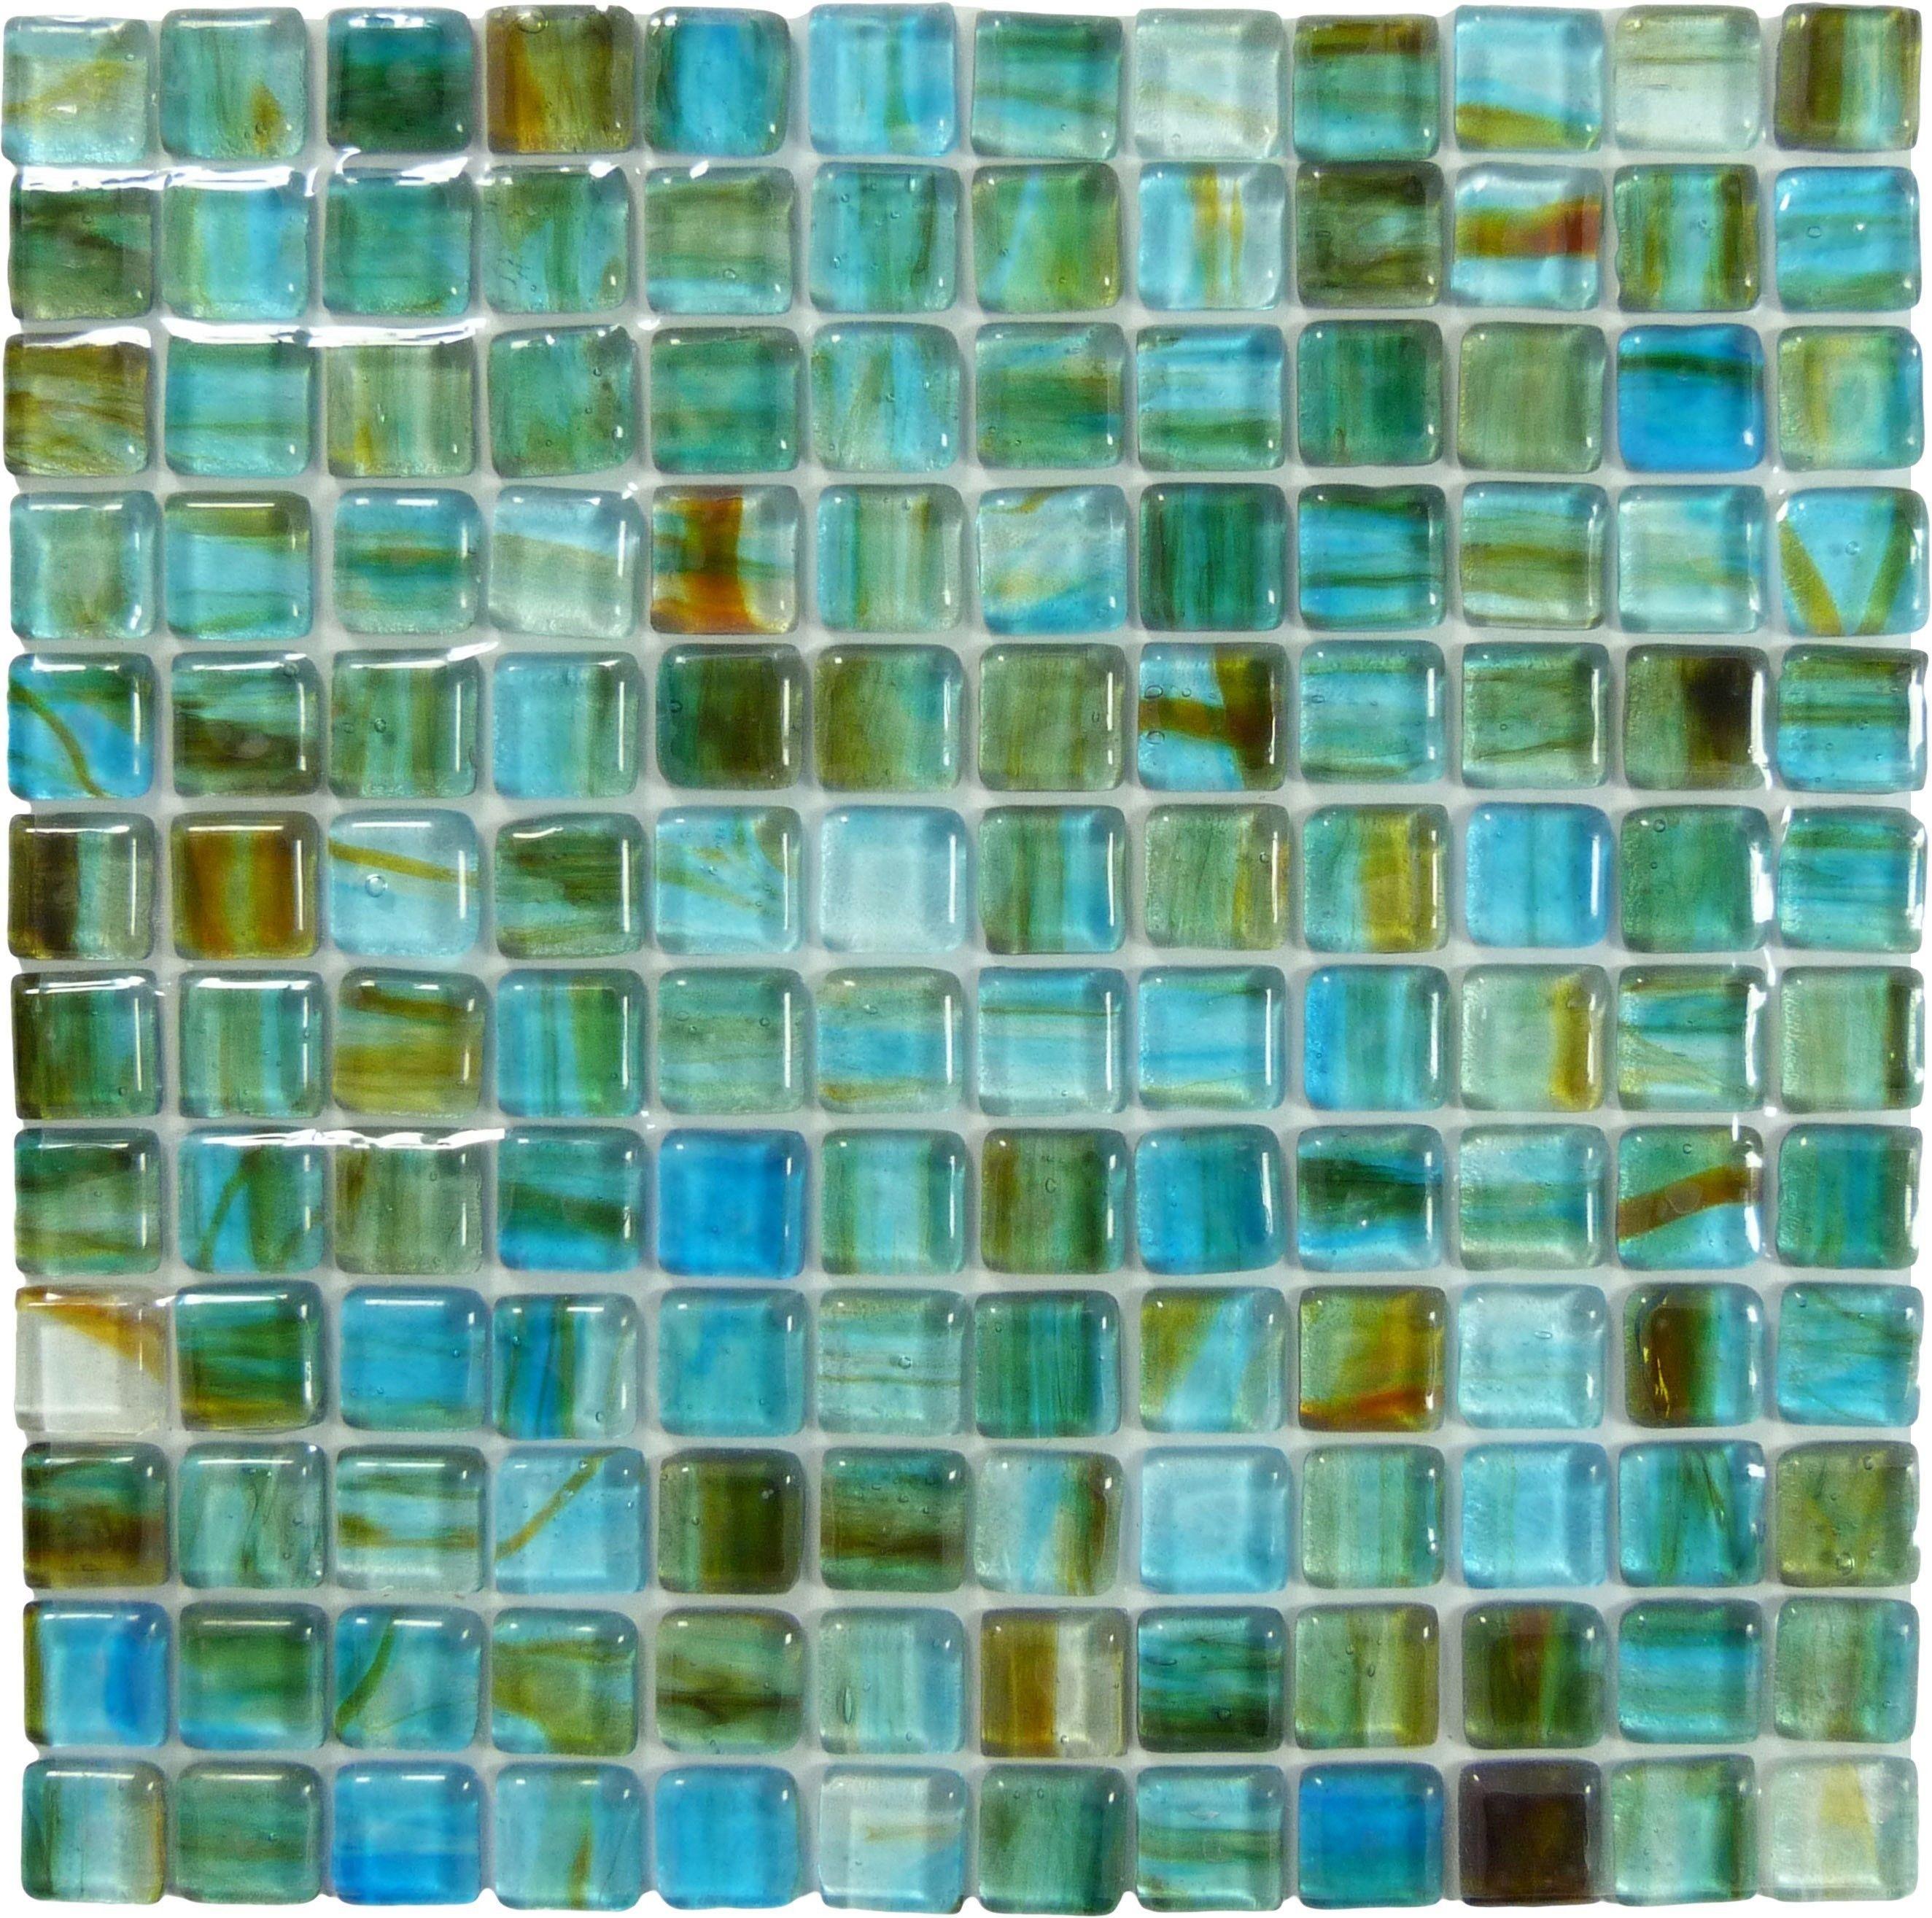 Hirsch 1 X 1 Blue Glass Square Tile Glossy Sf0270 Sea Glass Tile Glass Tile Colored Glass Tile